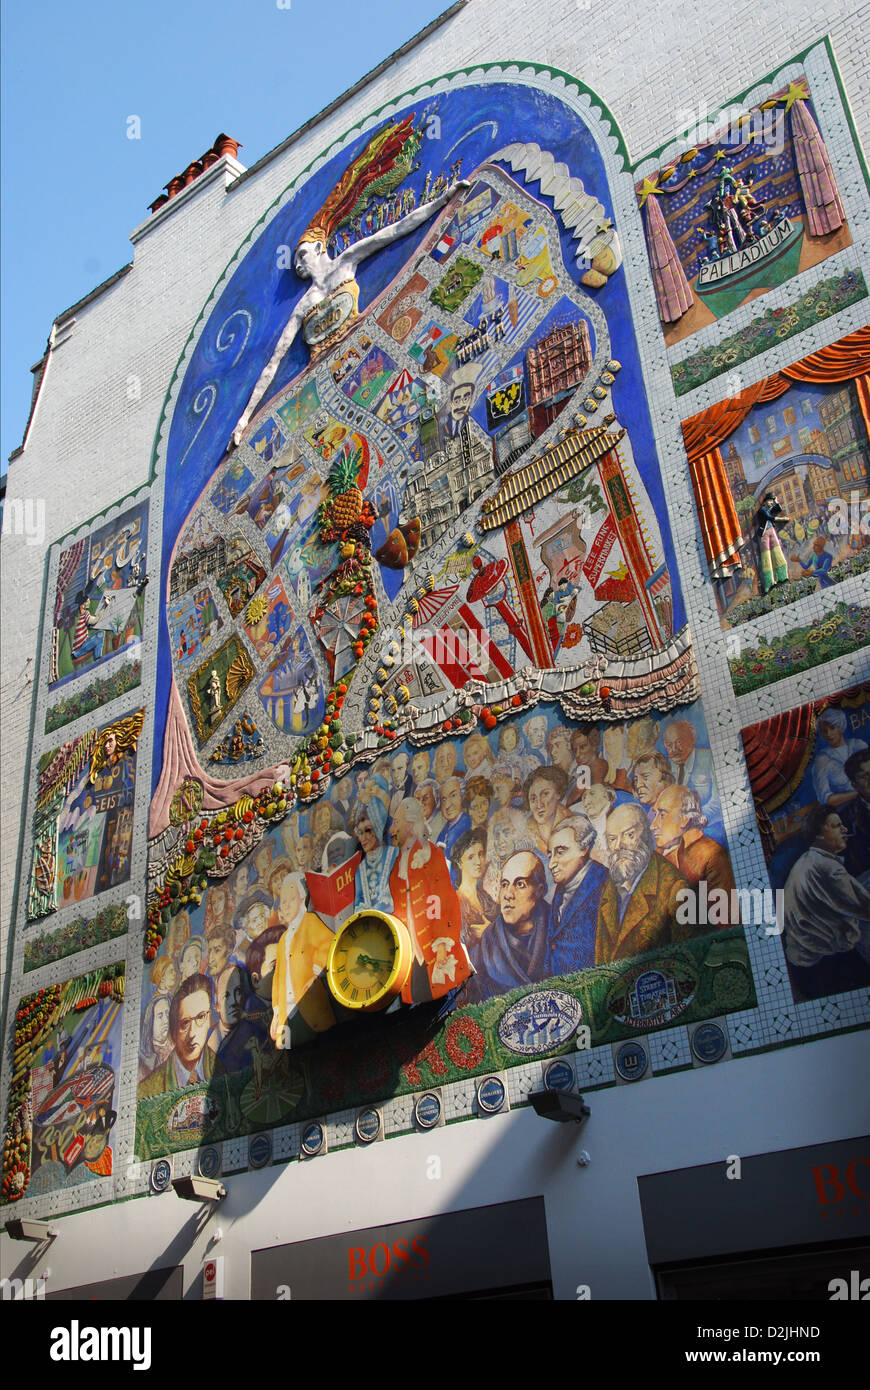 The Spirit of Soho, mural in Broadwick Street, close to Carnaby Sreet London - Stock Image